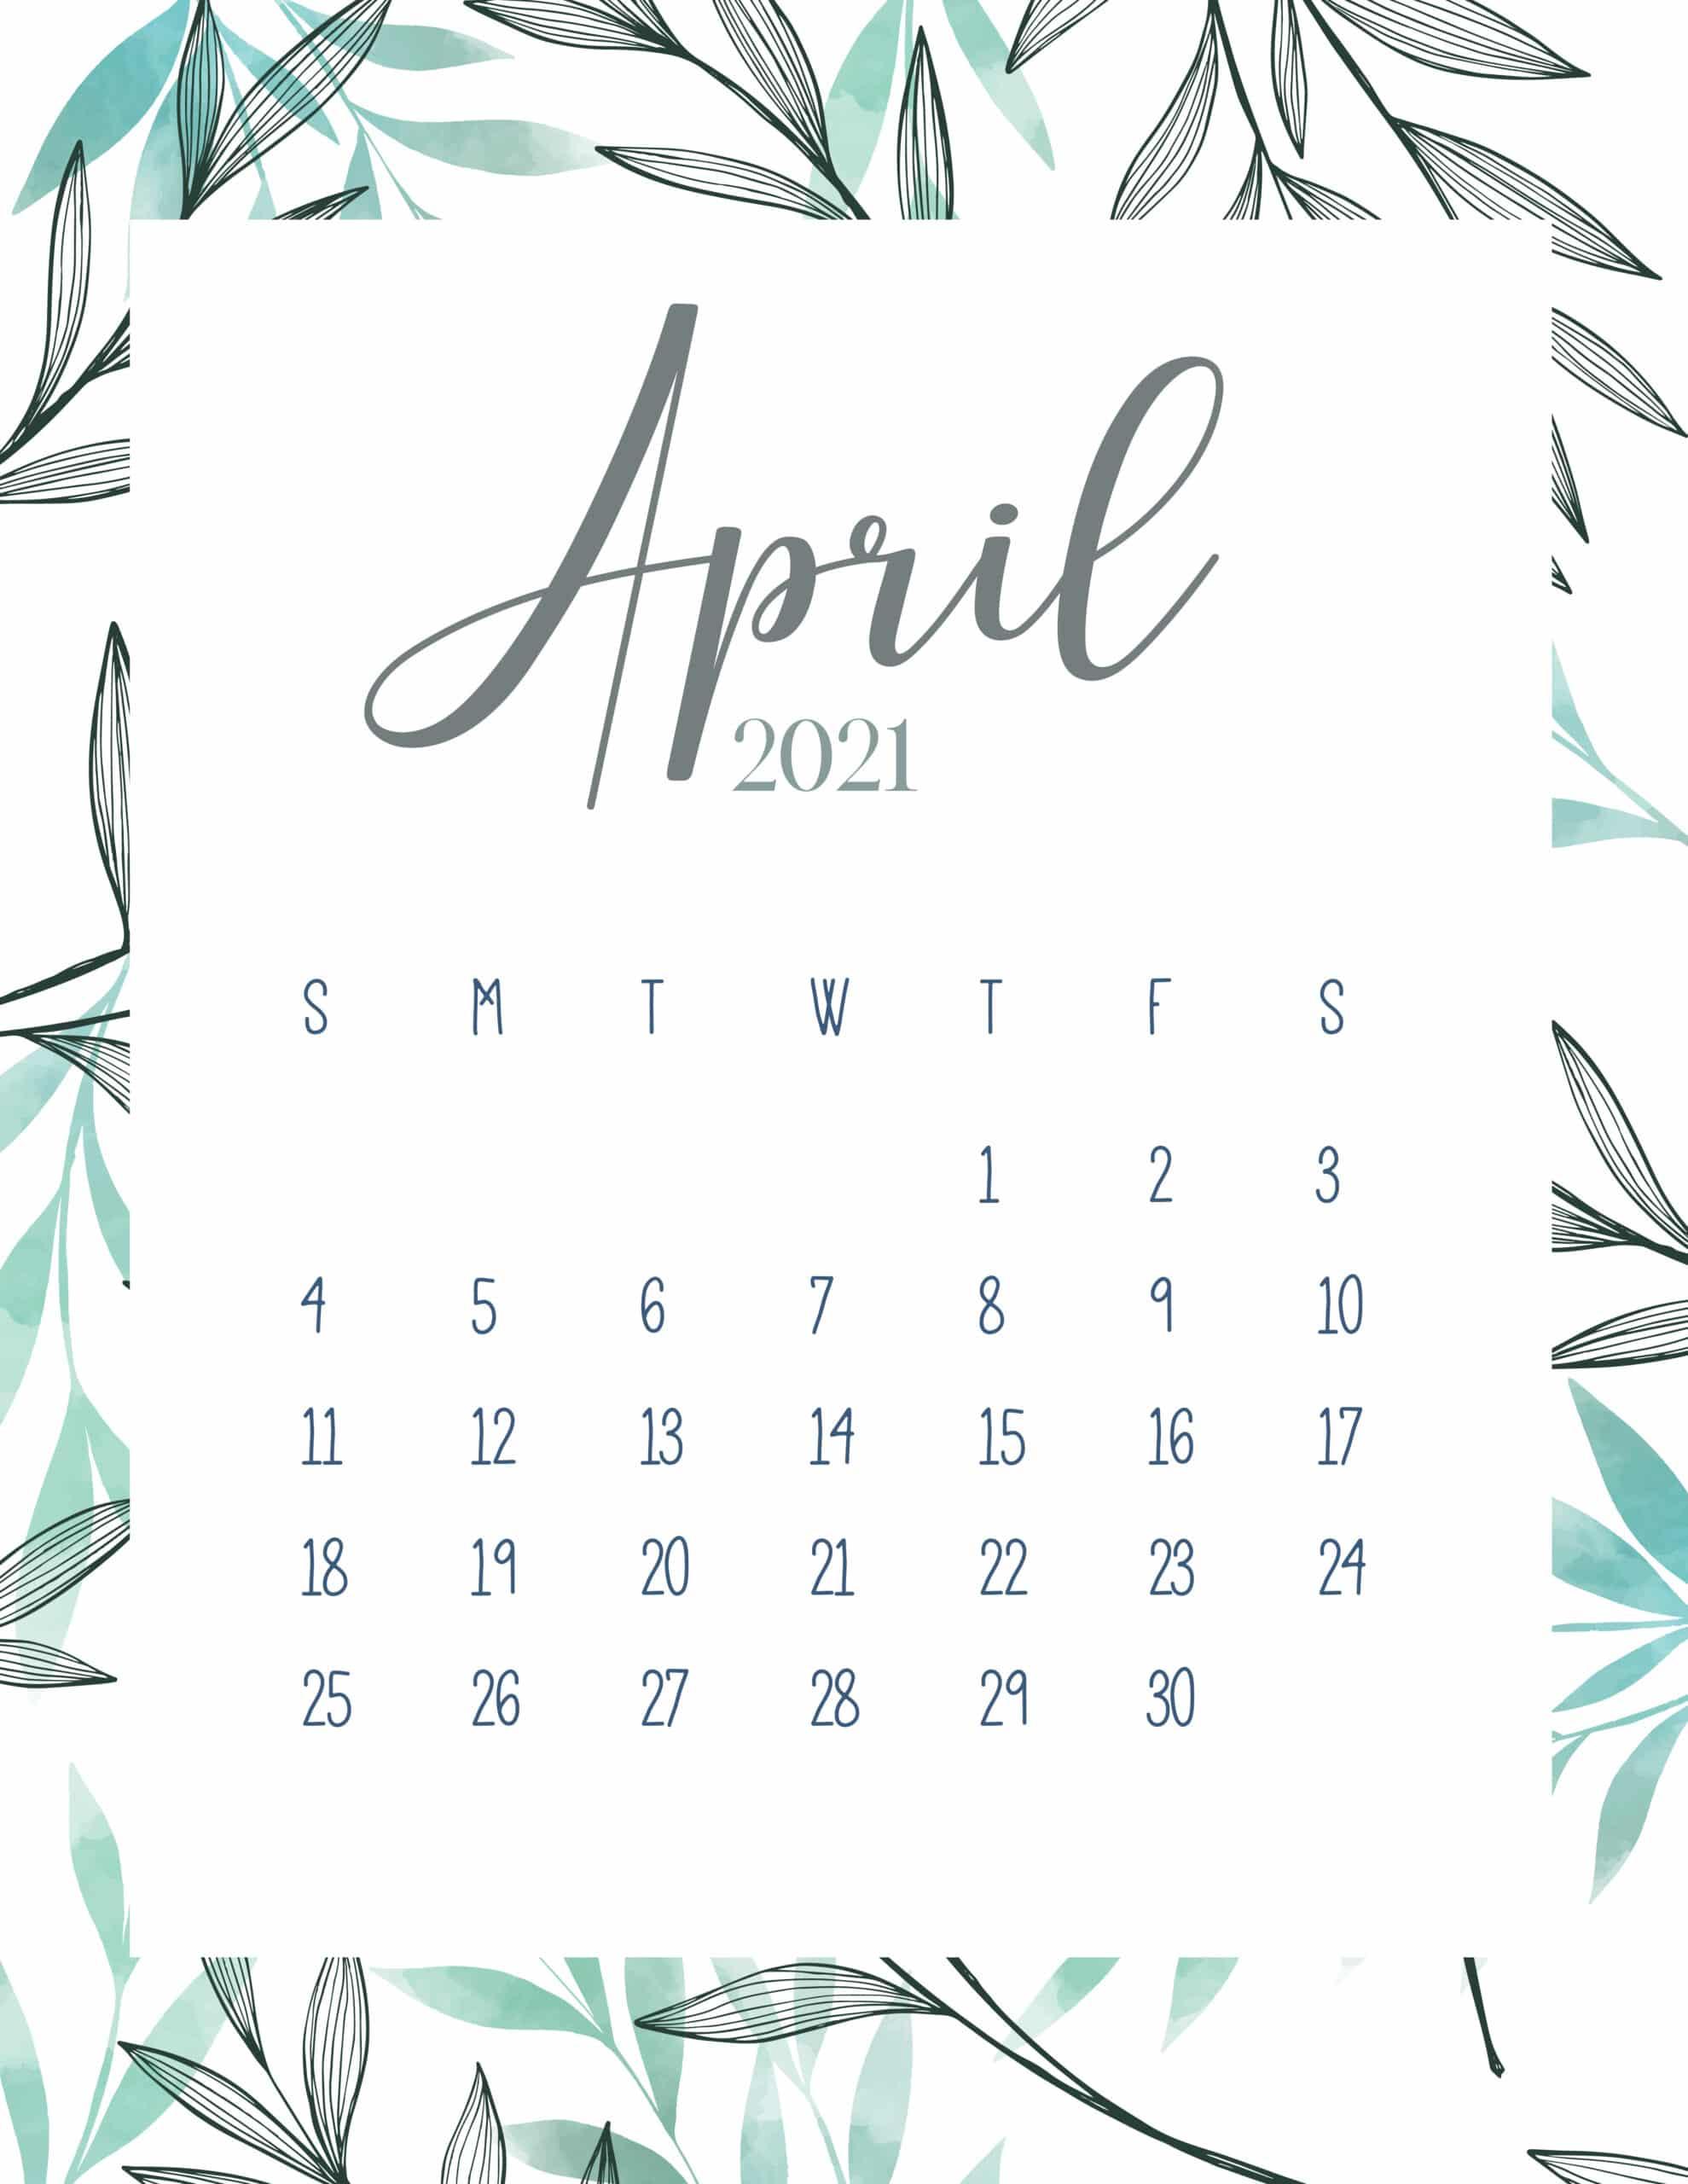 Free Printable 2021 Botanical Calendar - World of Printables